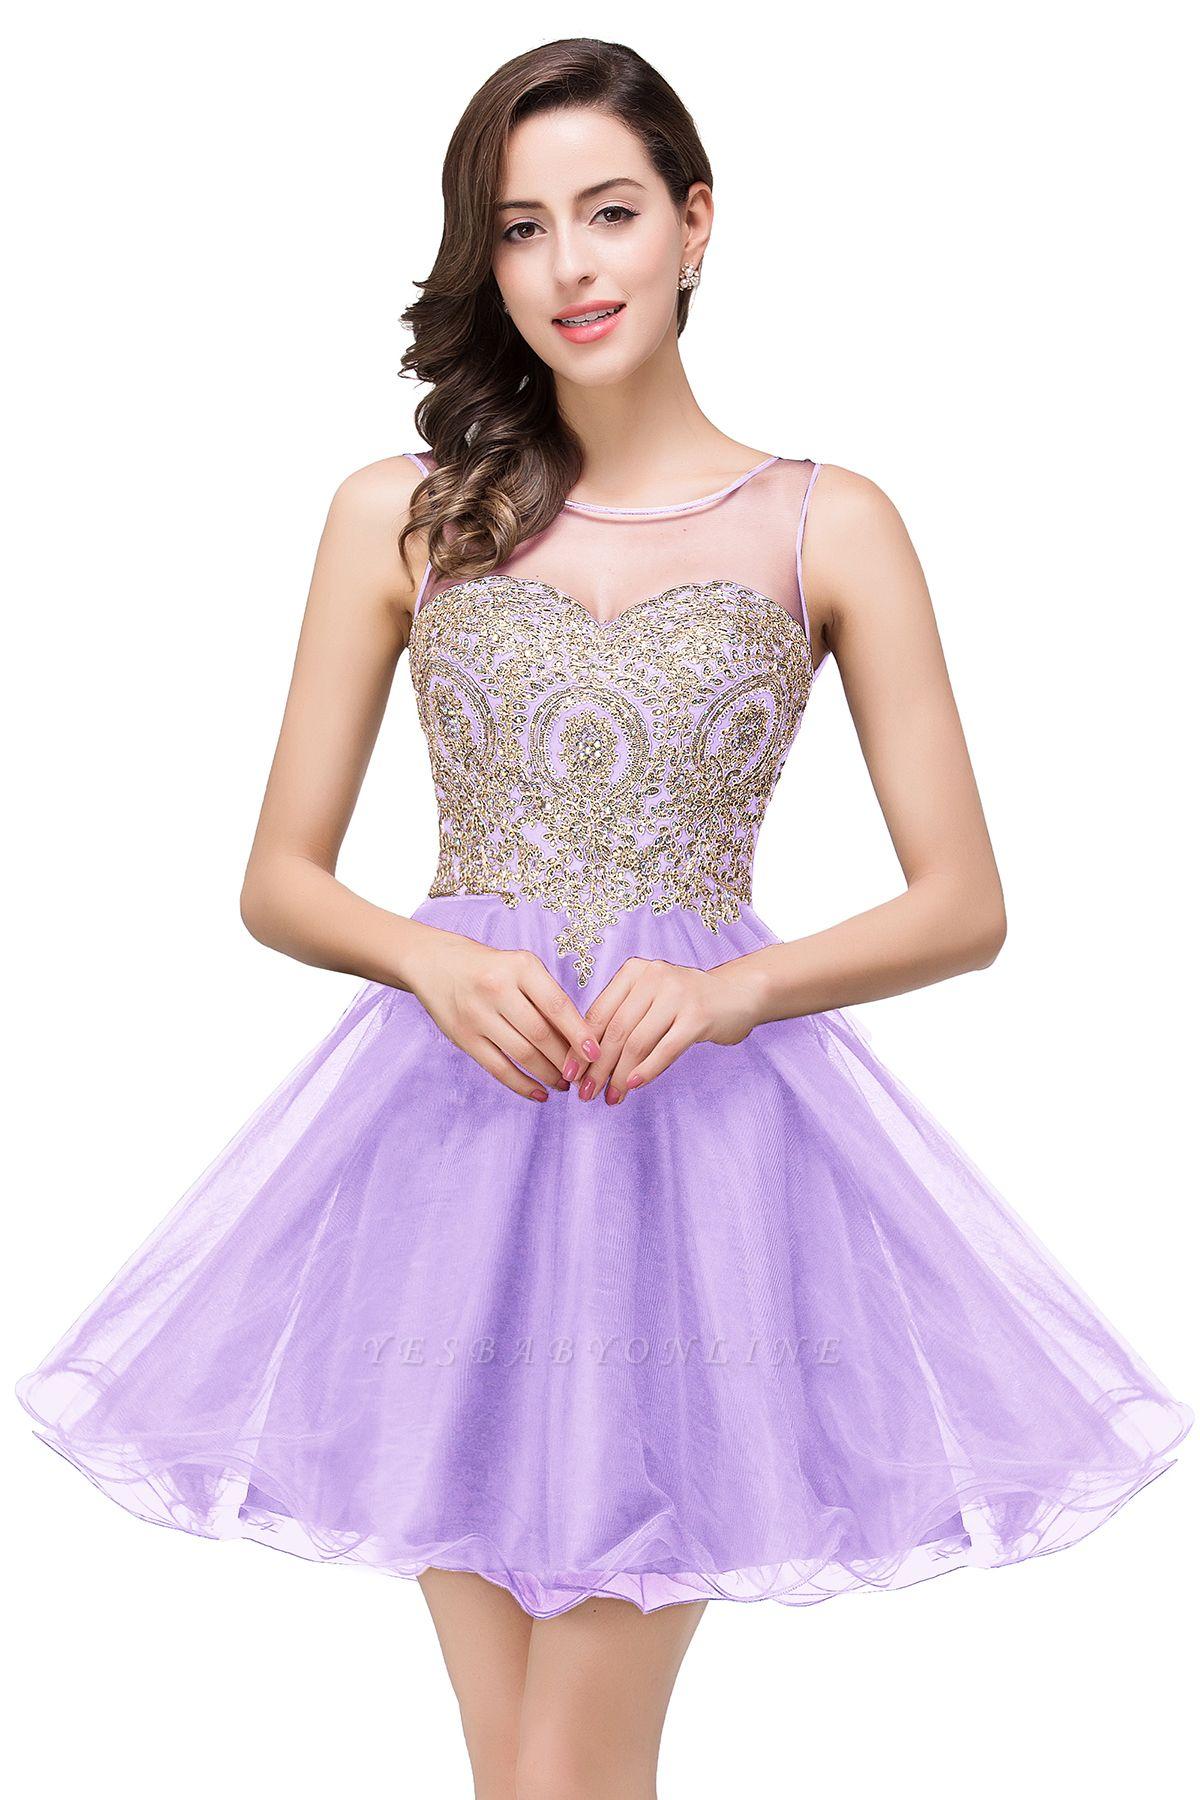 ESTRELLA | A-line Crew Short Sleeveless Appliques Prom Dress